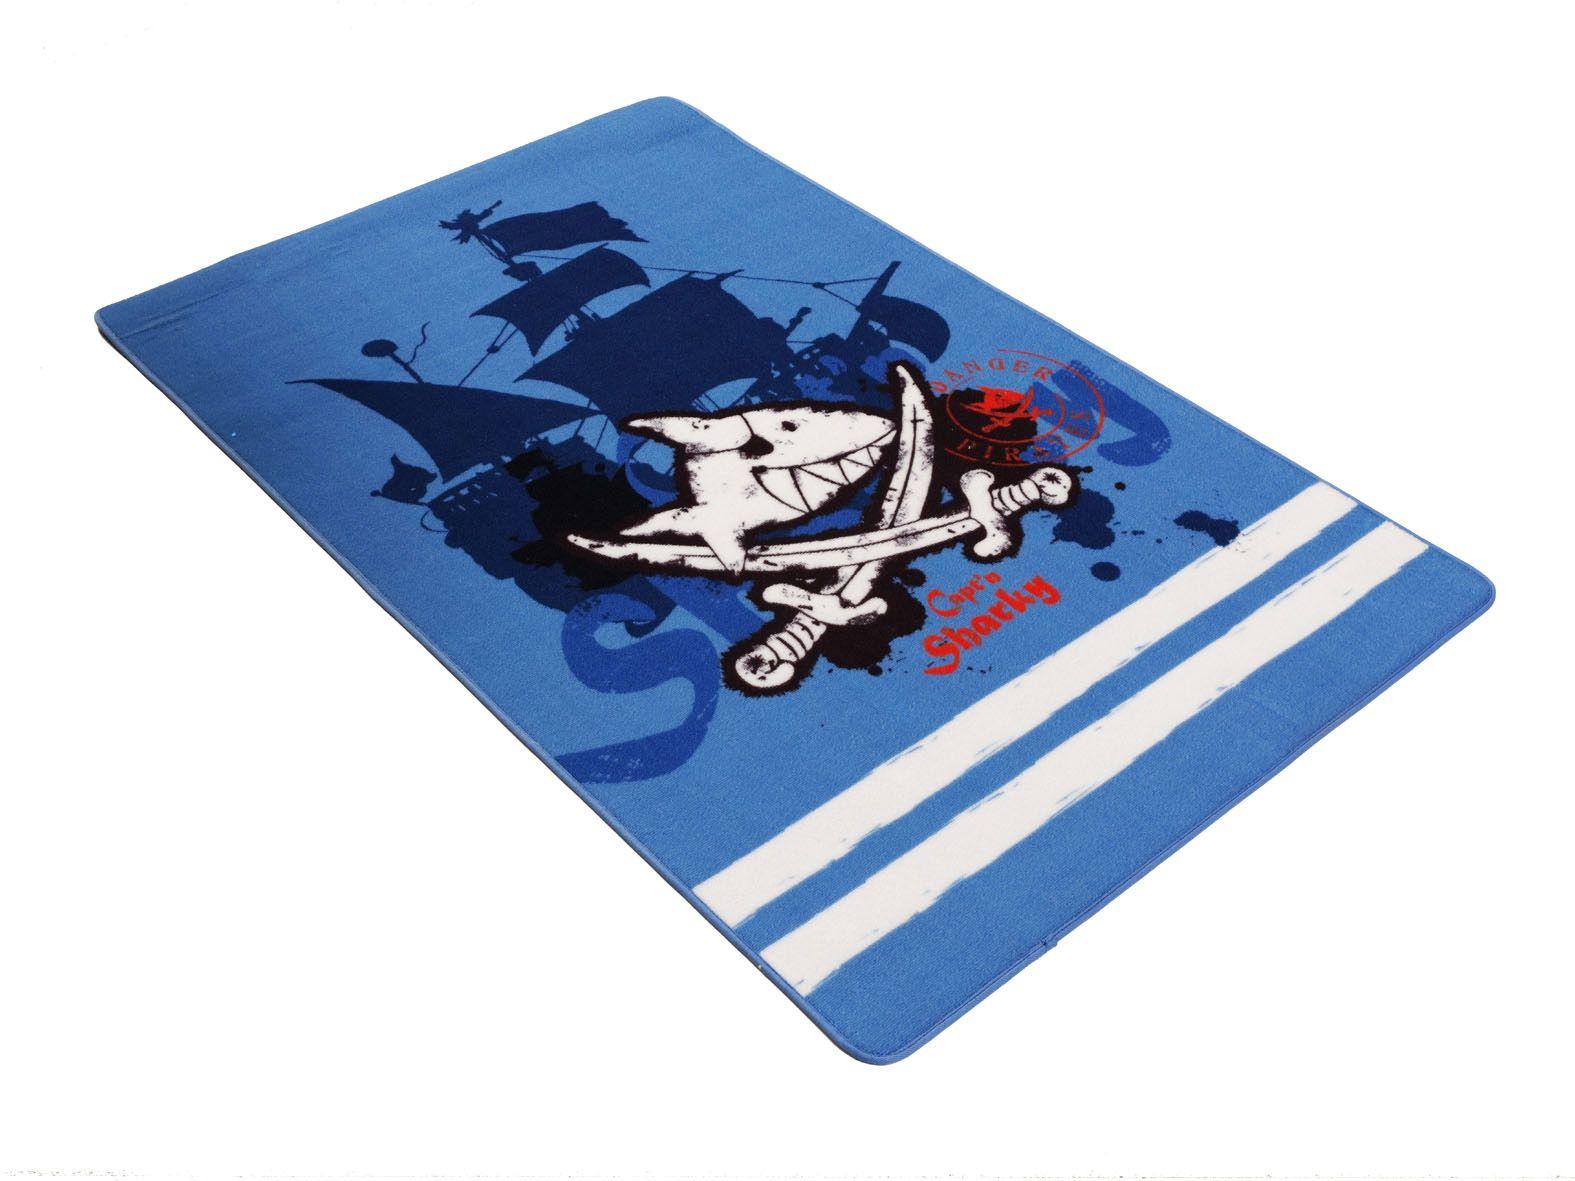 CAPTN SHARKY Kinder-Teppich, Capt'n Sharky, »SH-305«